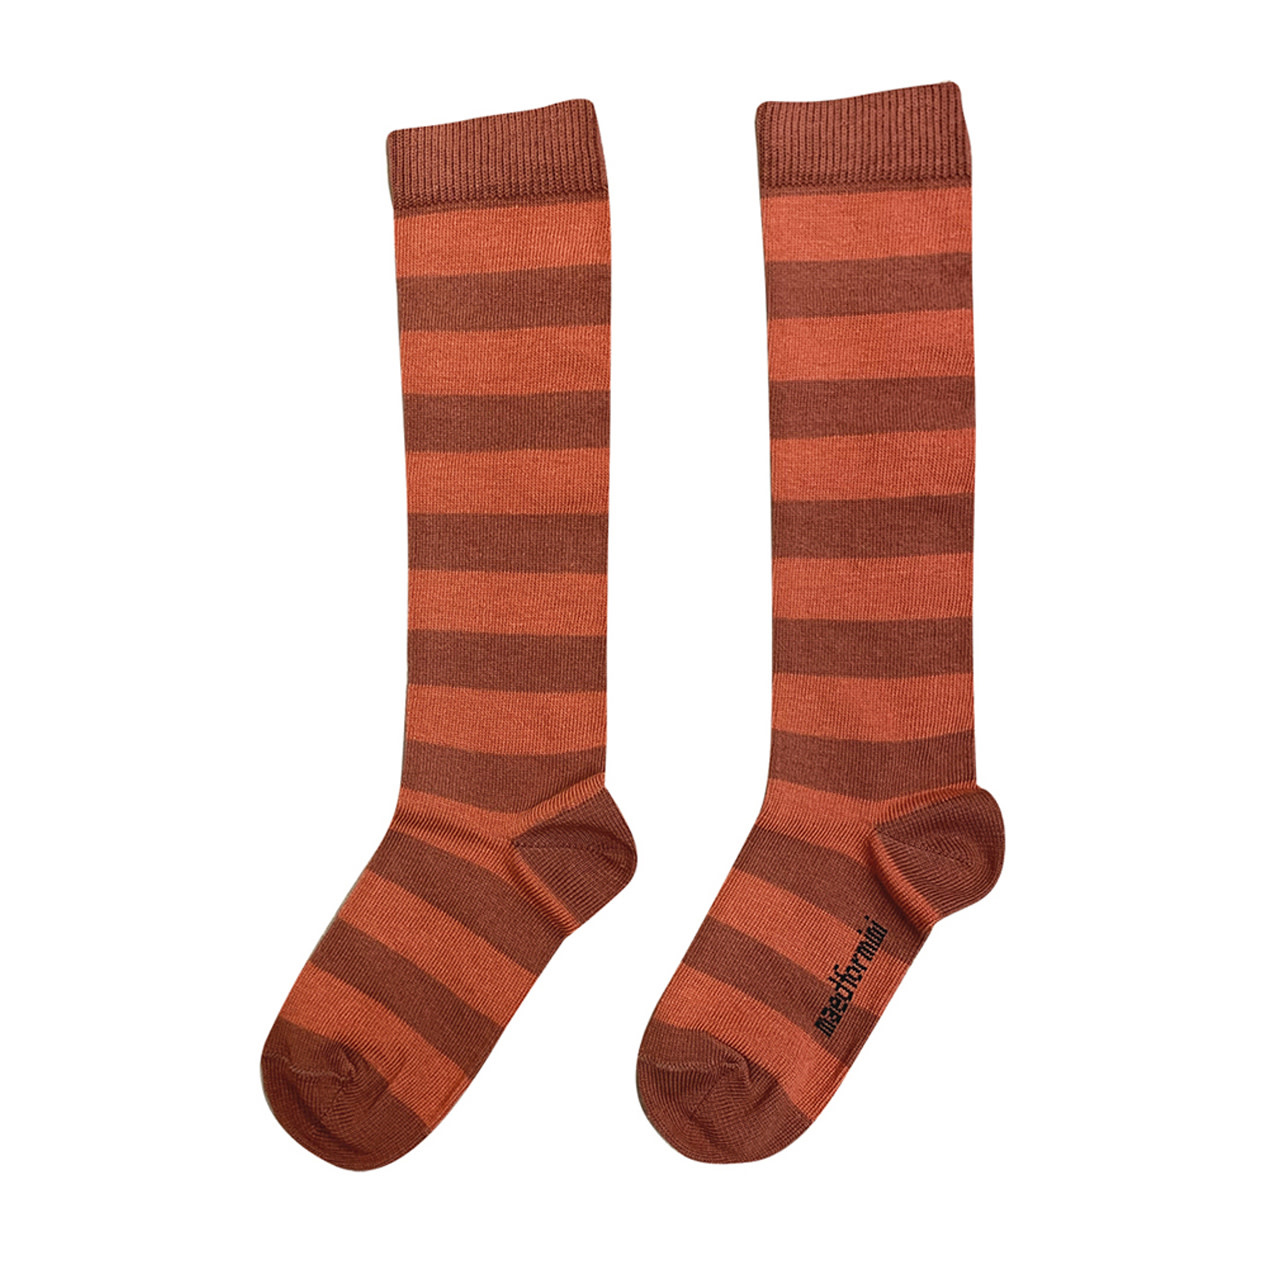 Maed For mini Maed for mini - Knee socks Rosy rabbit